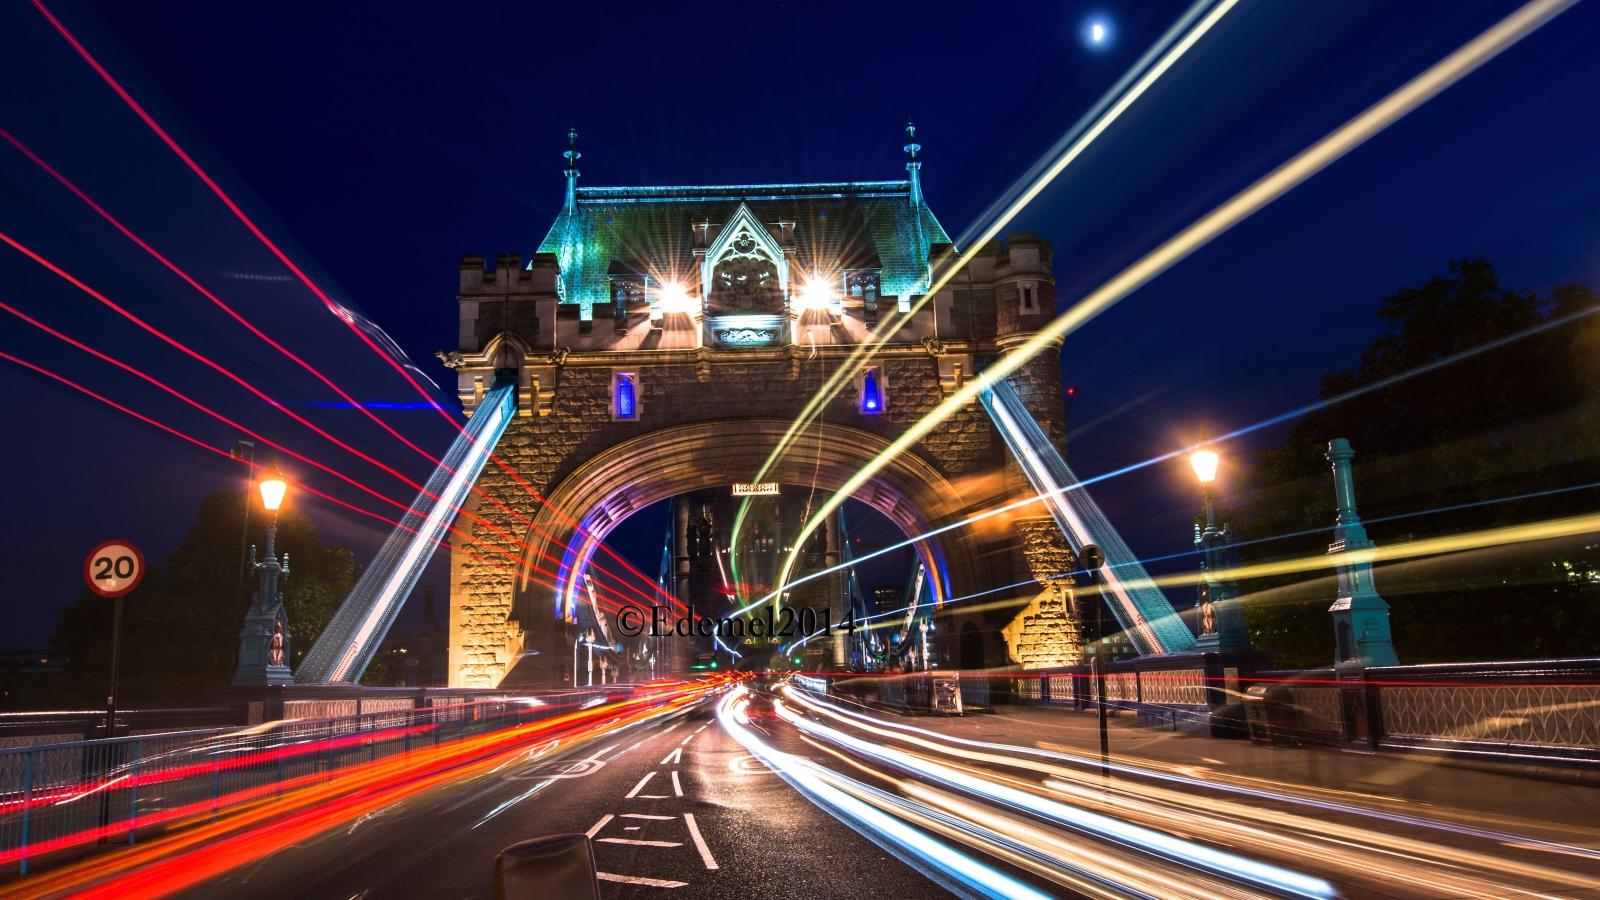 Puente en London - 1600x900